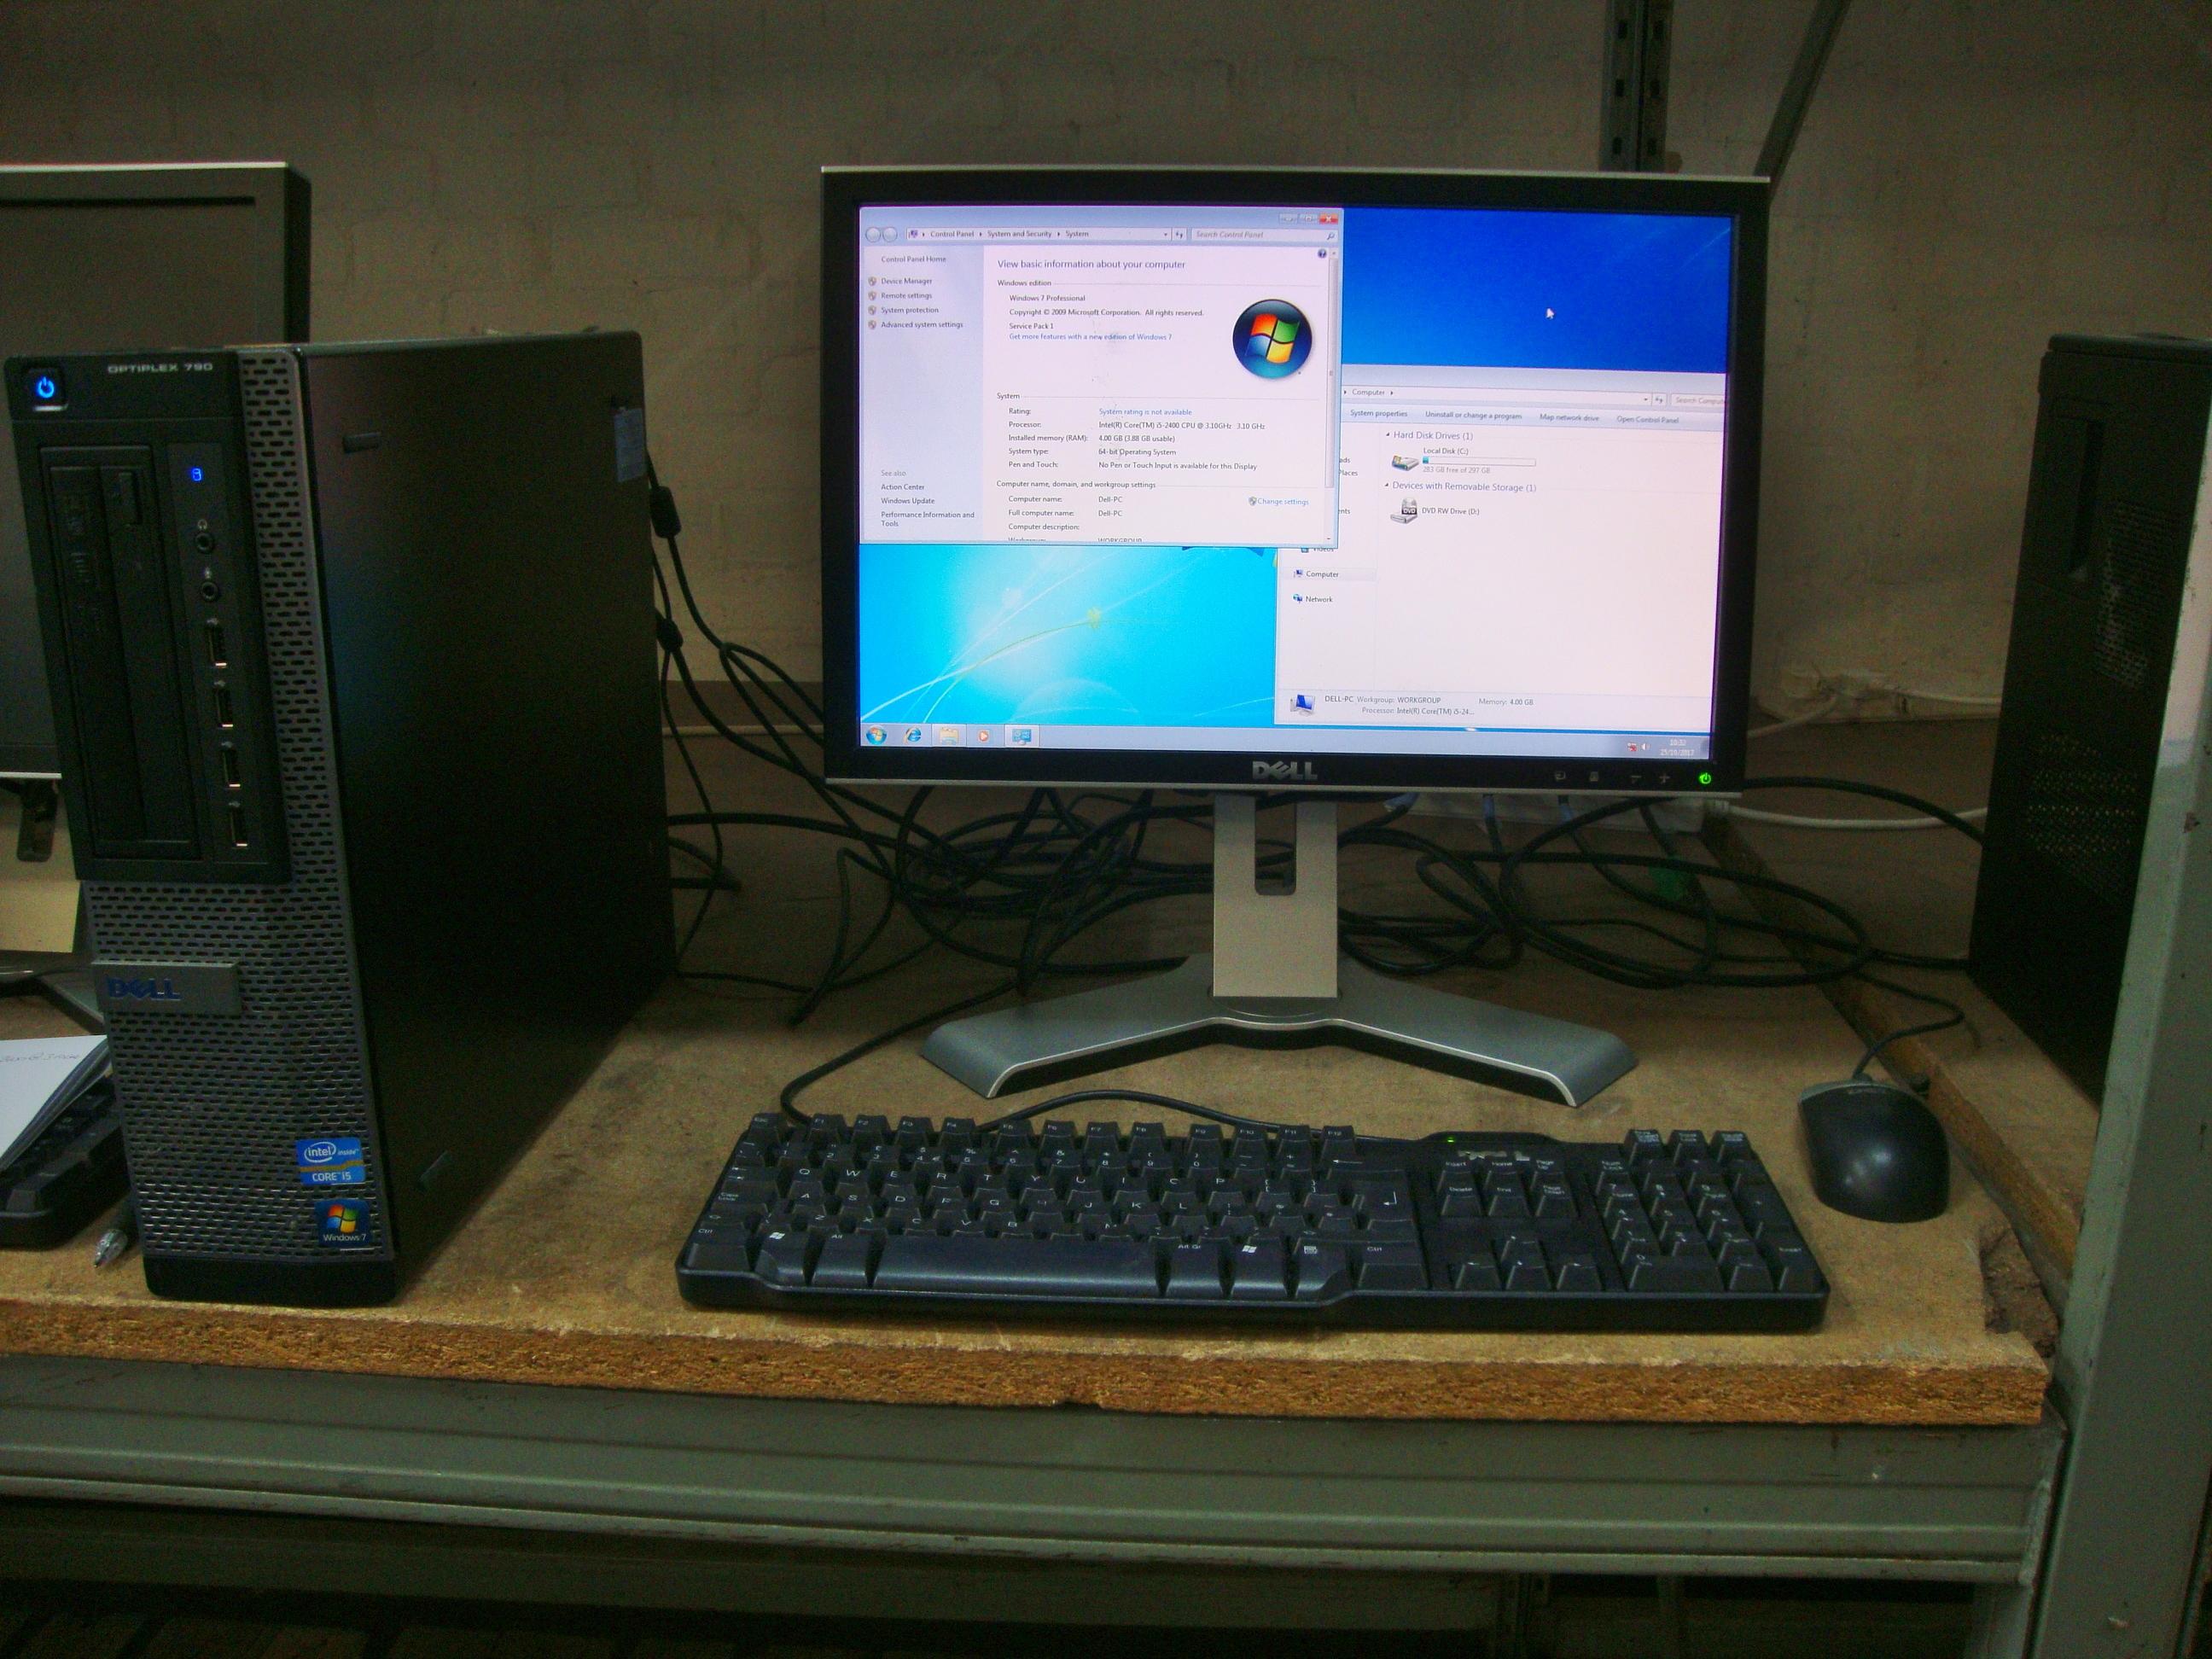 P6573 Dell Gx280 Optiplex Tower also Big moreover Dell Or Hp Core I5 Windows 7 Desktop 2 8 Ghz 3 moreover  also 6784616. on dell optiplex 790 3 monitors